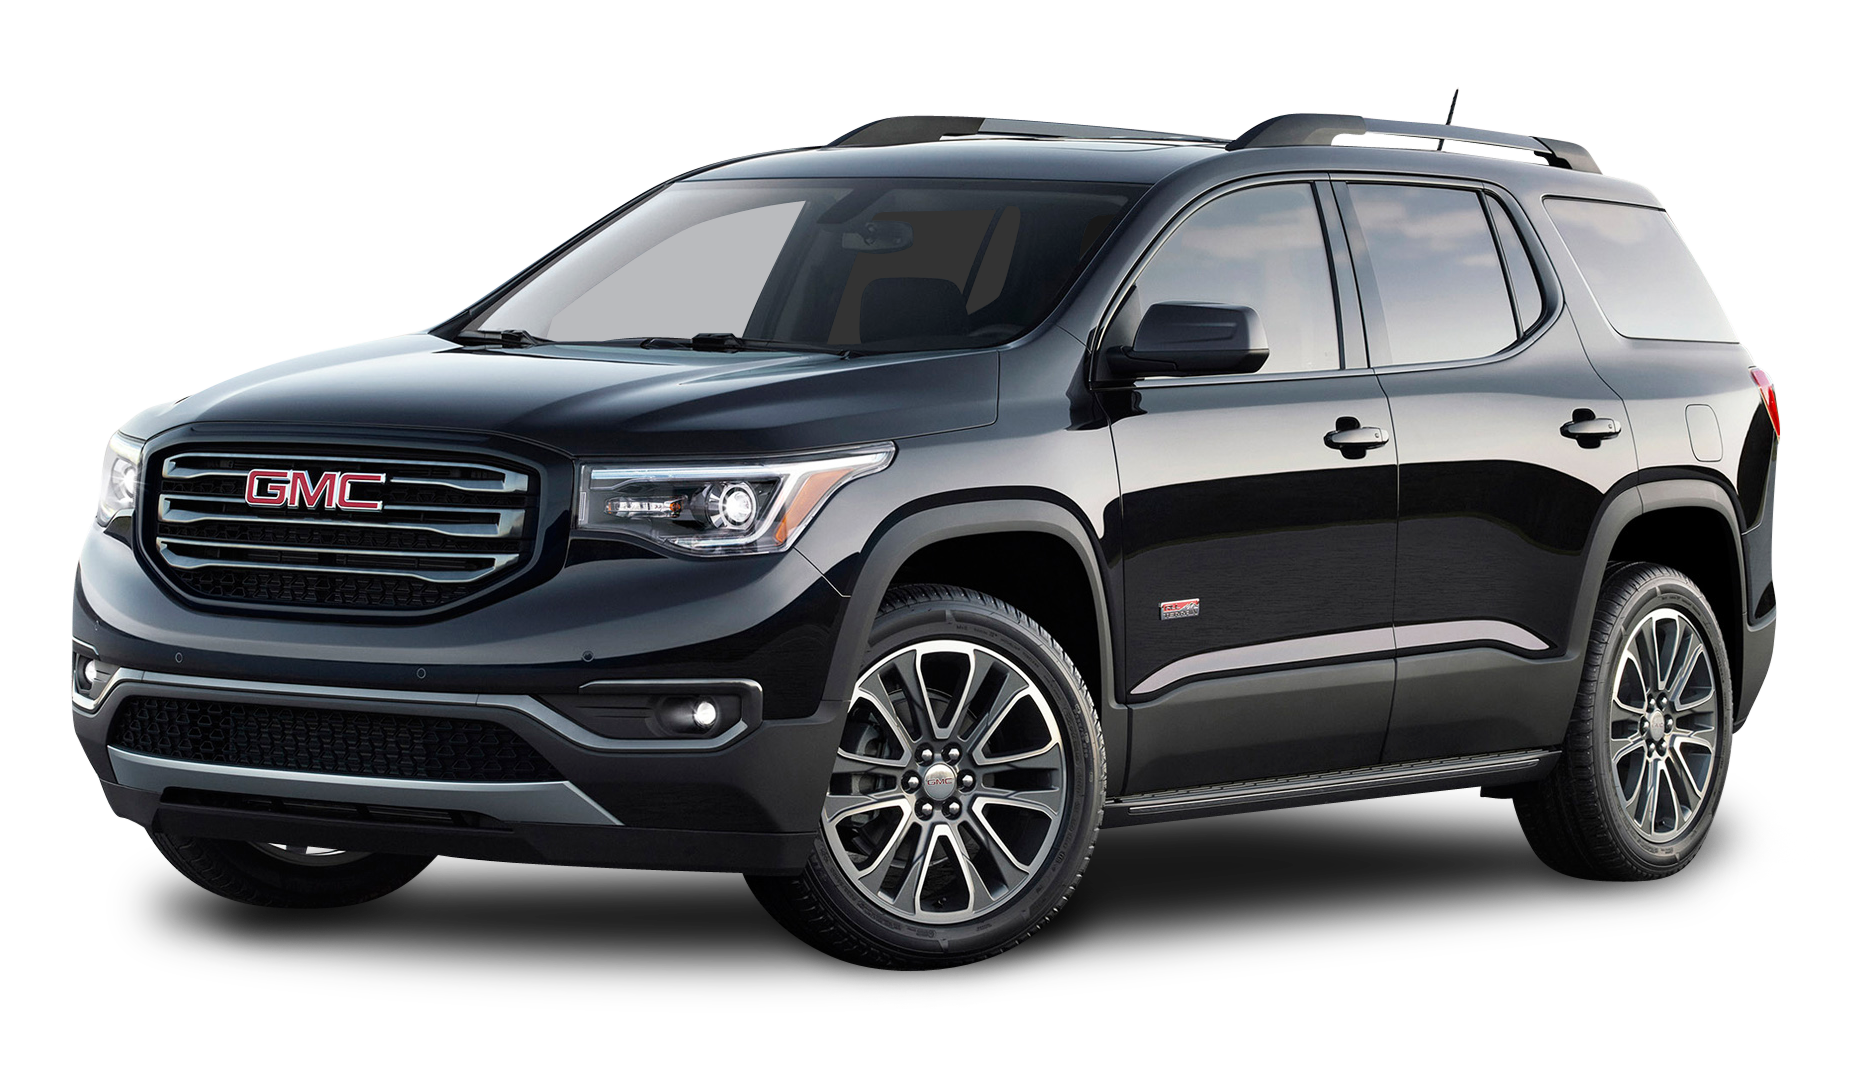 Black Gmc Acadia All Terrain Car Png Image Gmc Suv Car